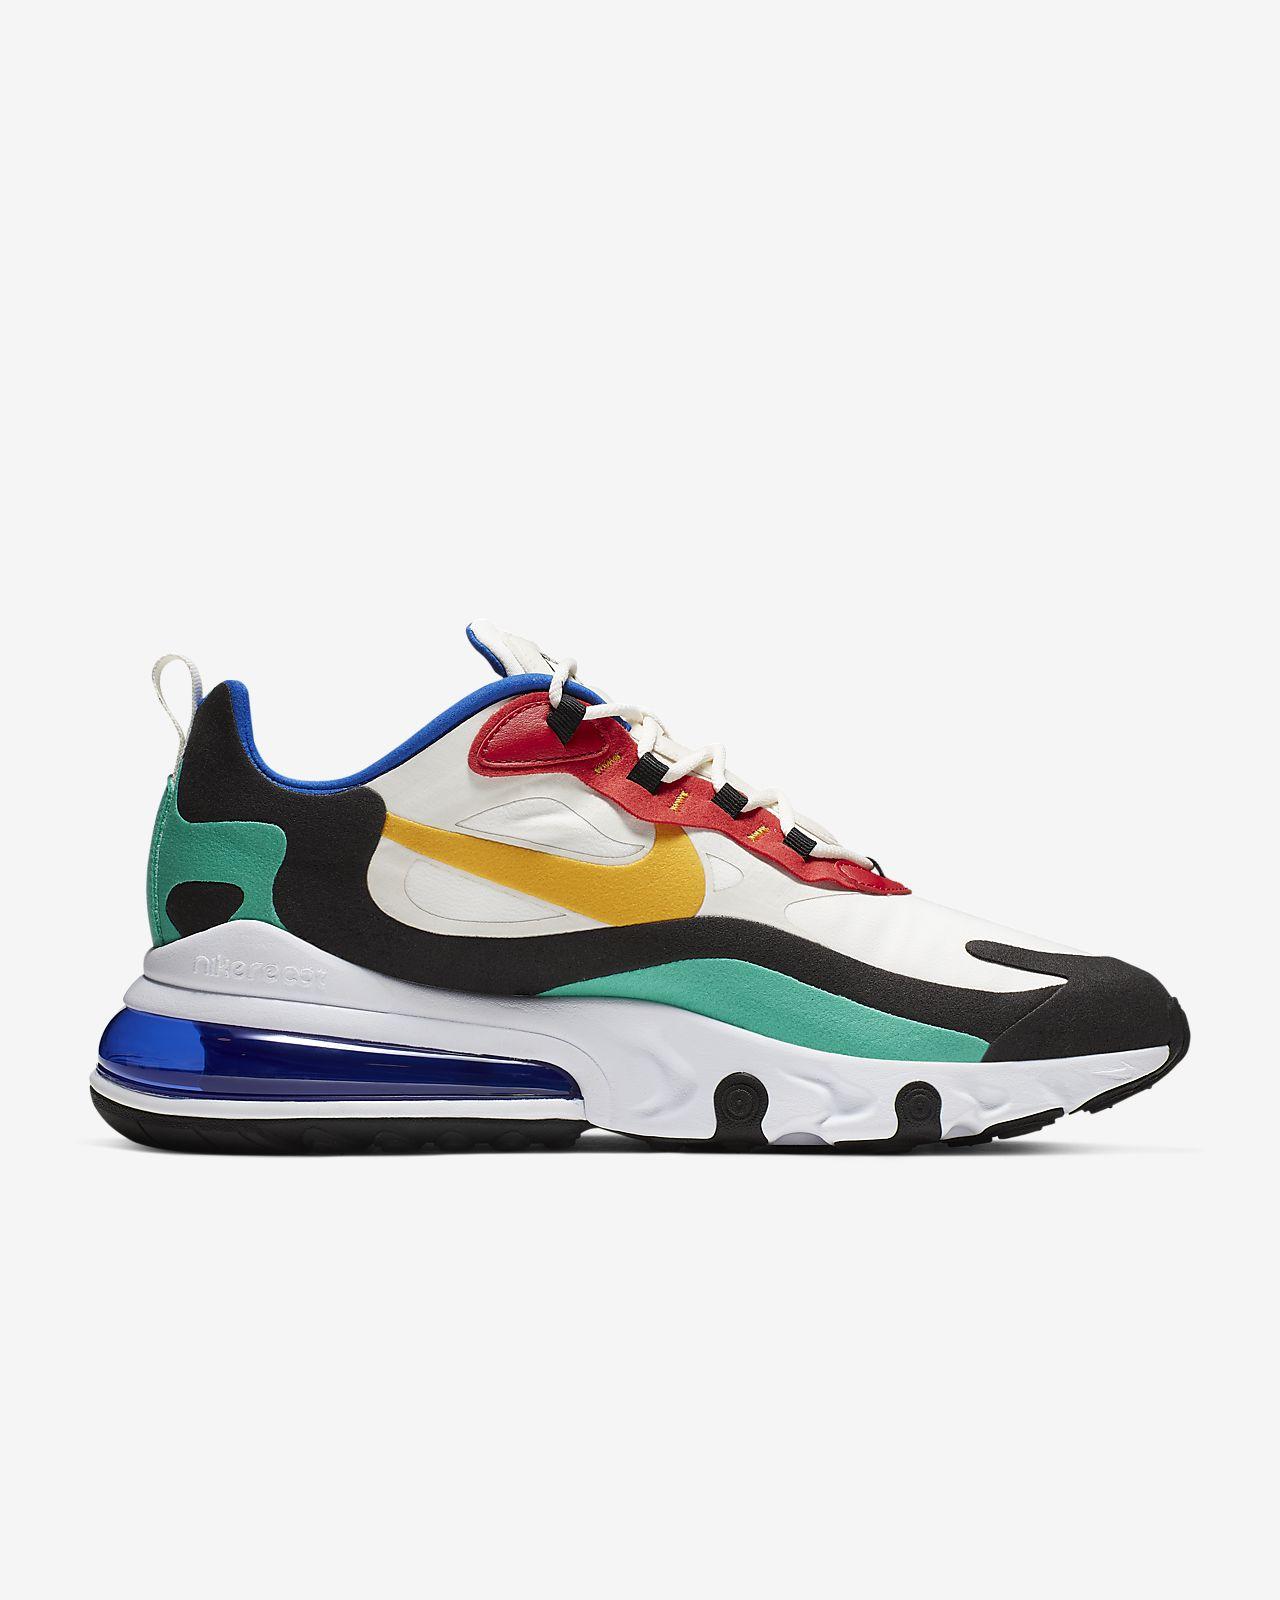 Chaussure Nike Air Max 270 React Bauhaus pour Homme. BE